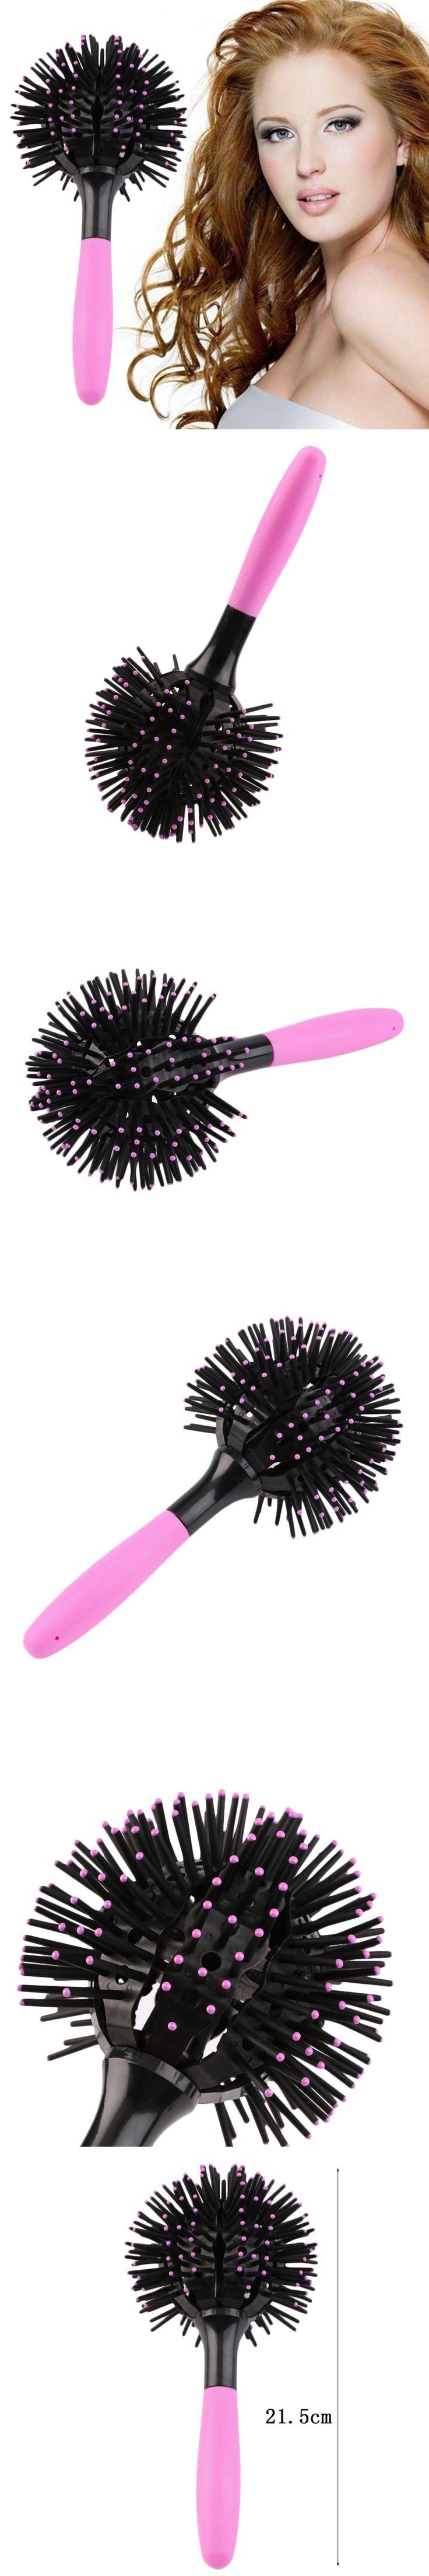 3D Round Hair Brush Hair Comb Salon make up 360 degree Ball Hair Care Styling Tools Magic Detangling Hairbrush Heat Resistant